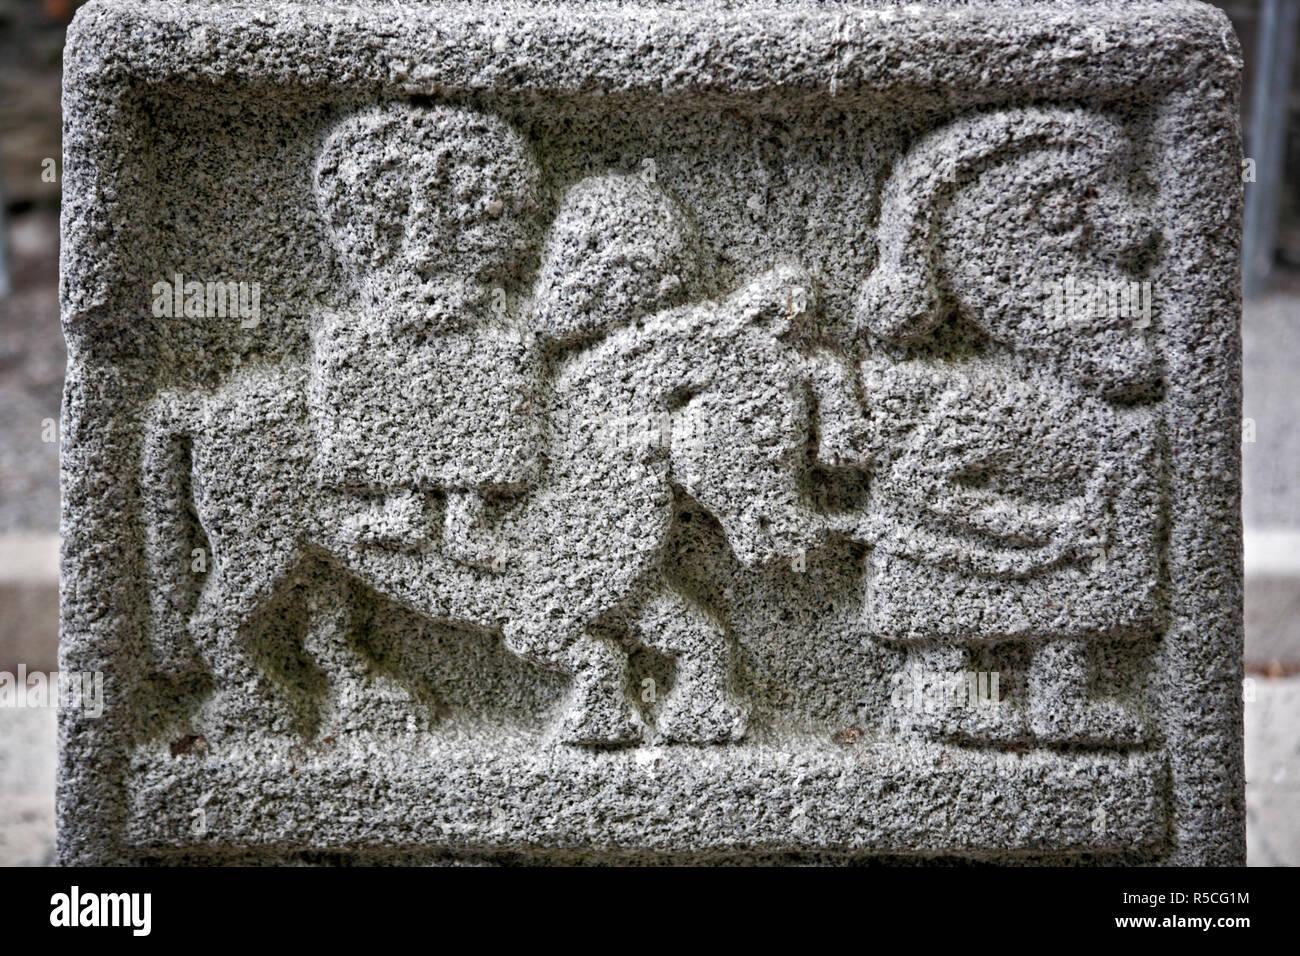 High Cross (8-9 century), Moone, County Kildare, Ireland - Stock Image